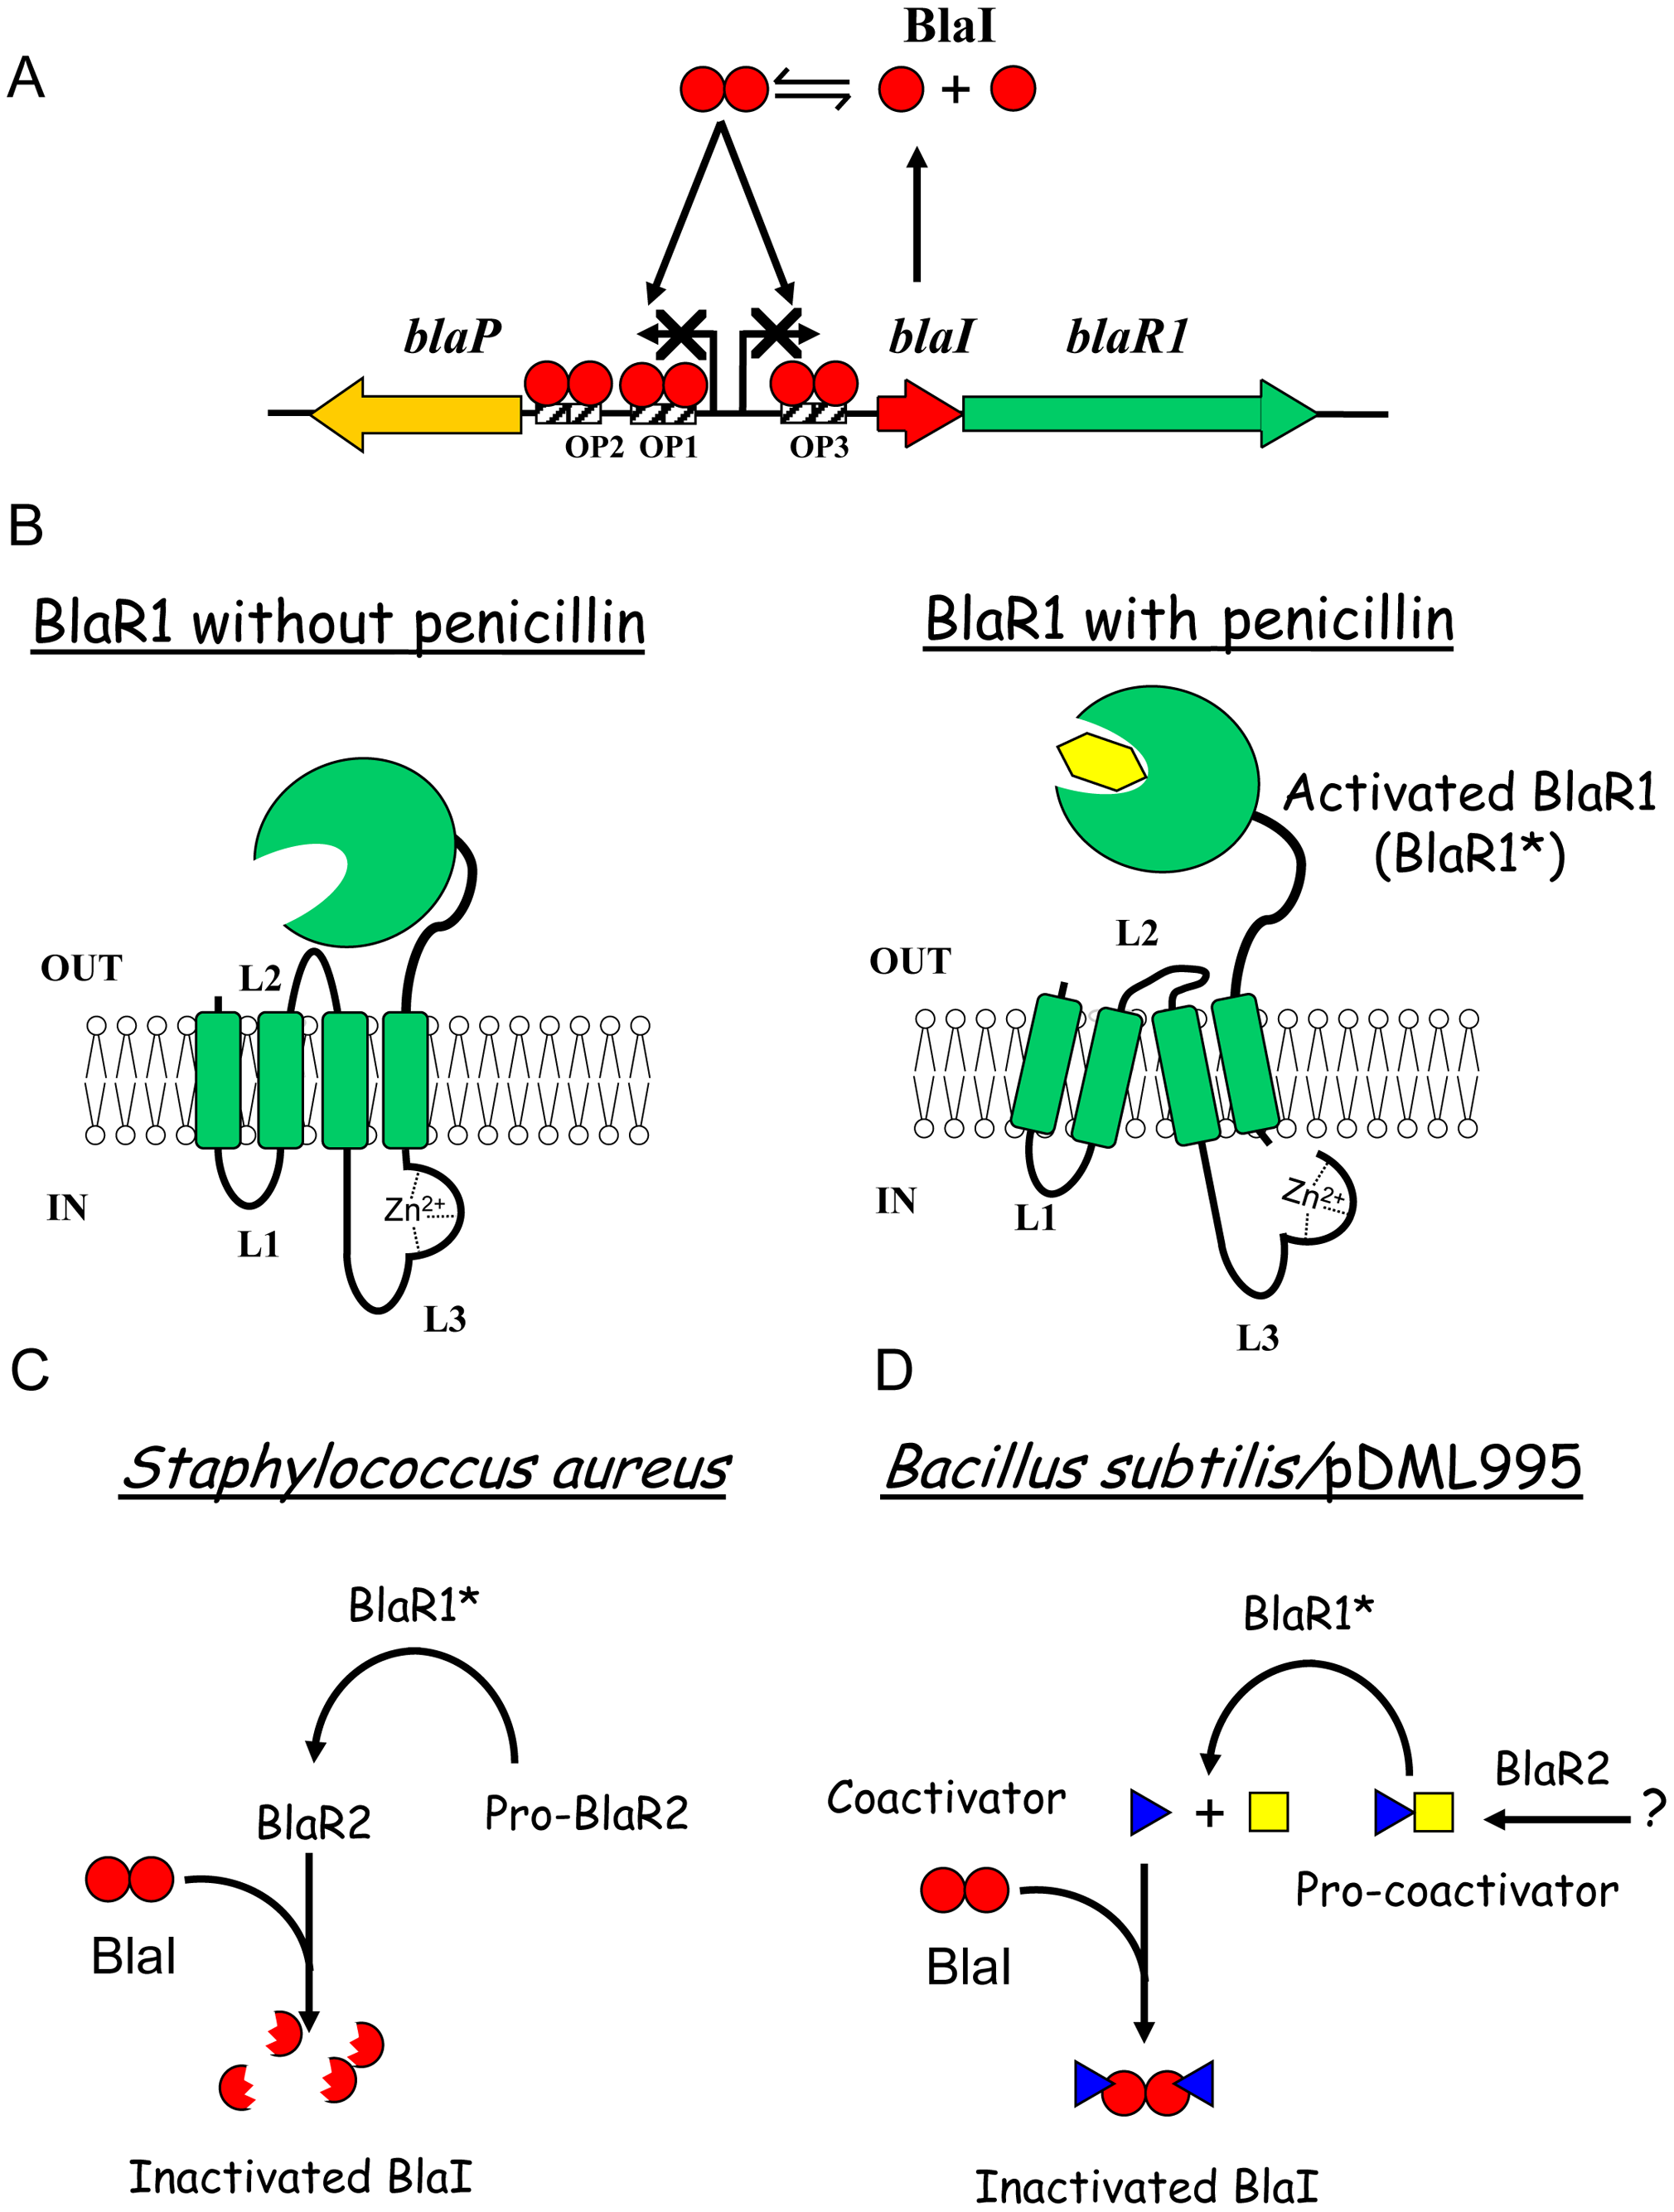 Beta-lactamase induction in <i>B. licheniformis</i> 749/I and <i>S. aureus</i>.